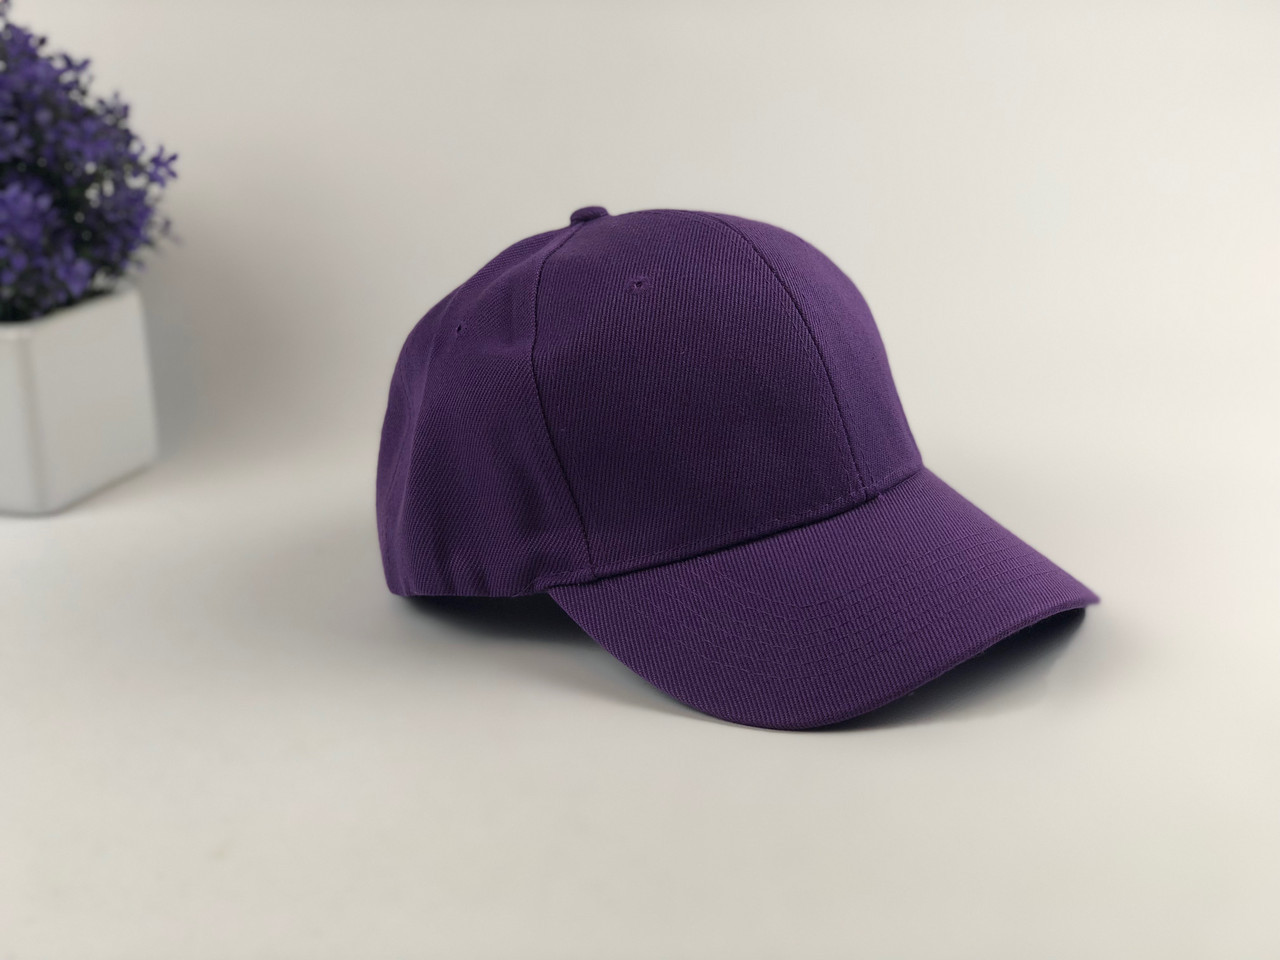 Кепка бейсболка Style (фиолетовая)